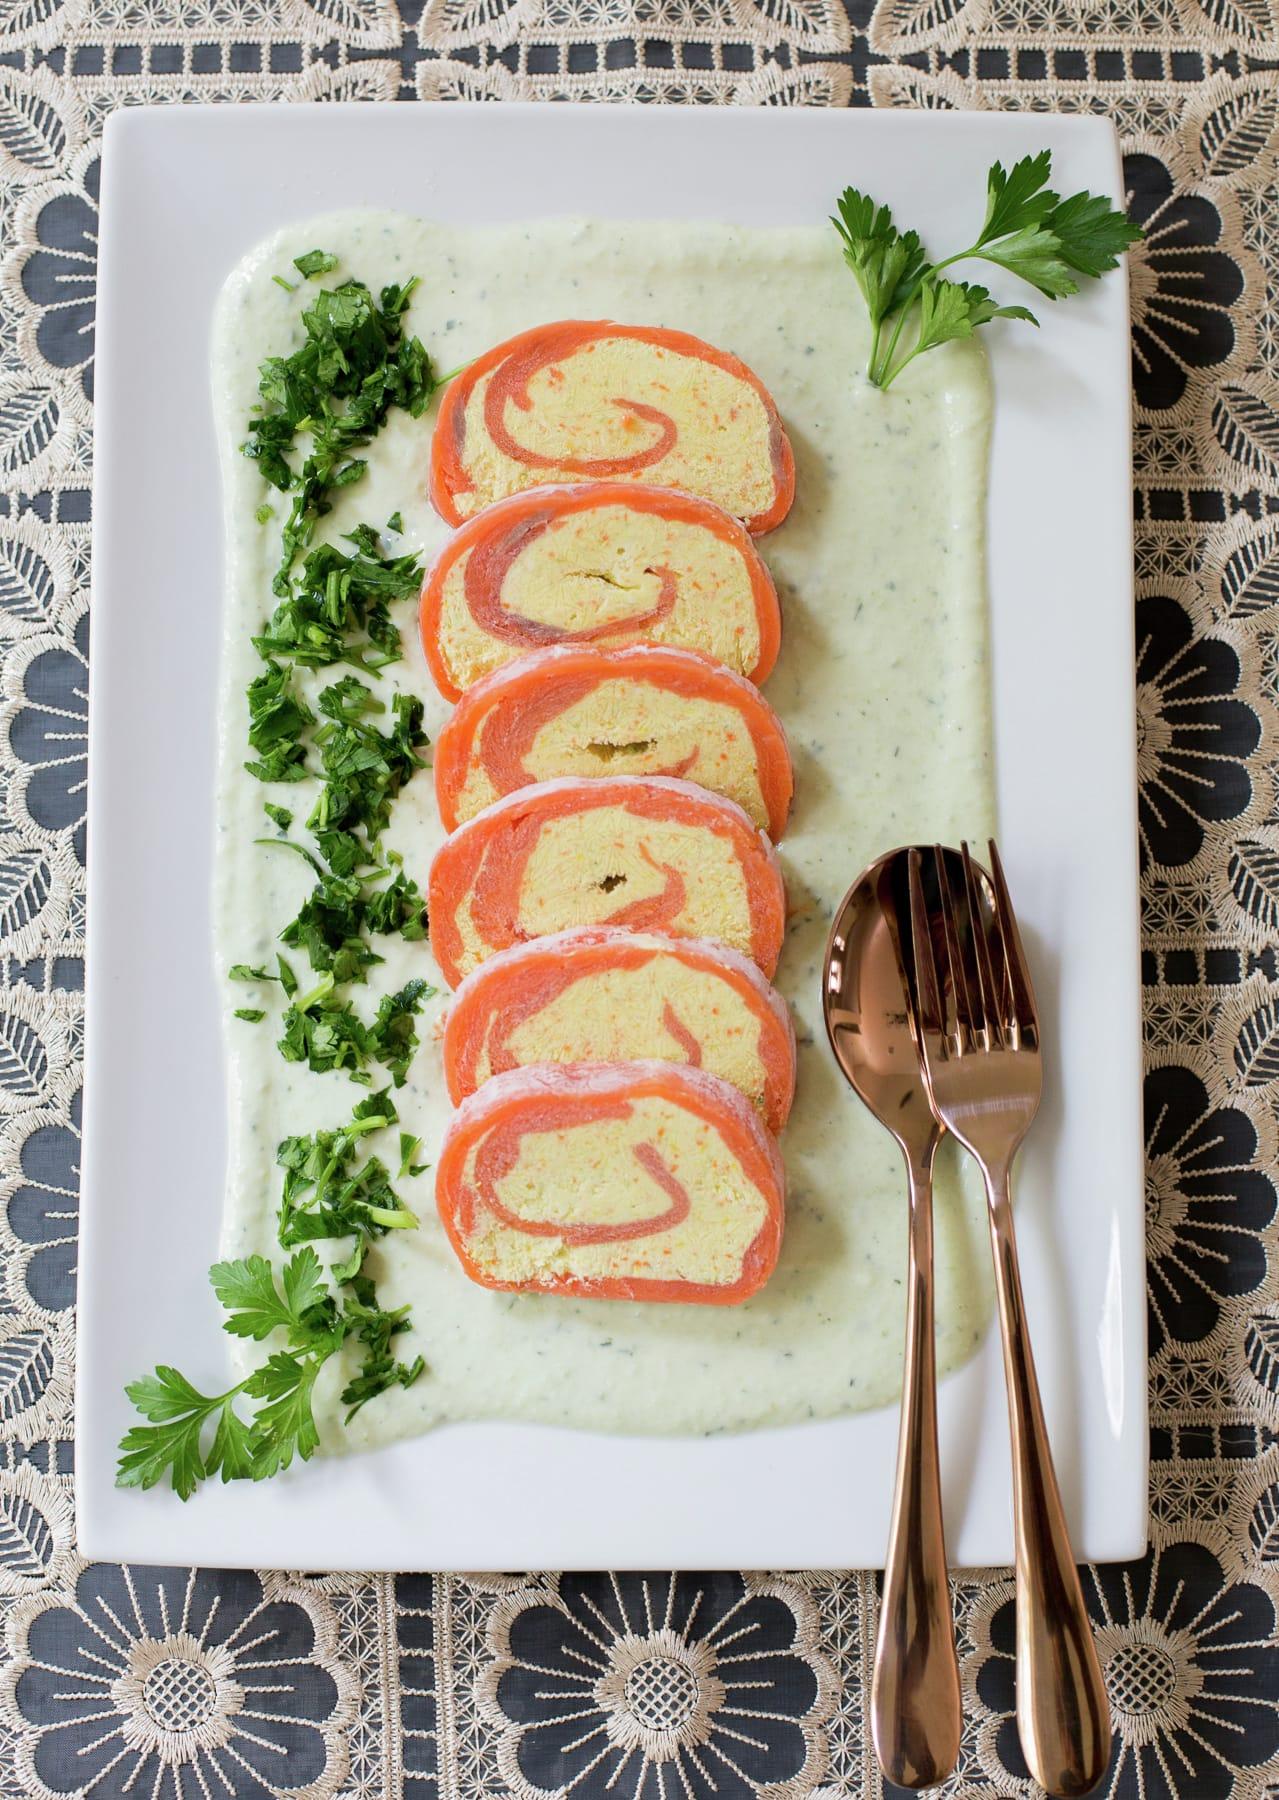 Smoked salmon roulade with cream cheese and avocado cream